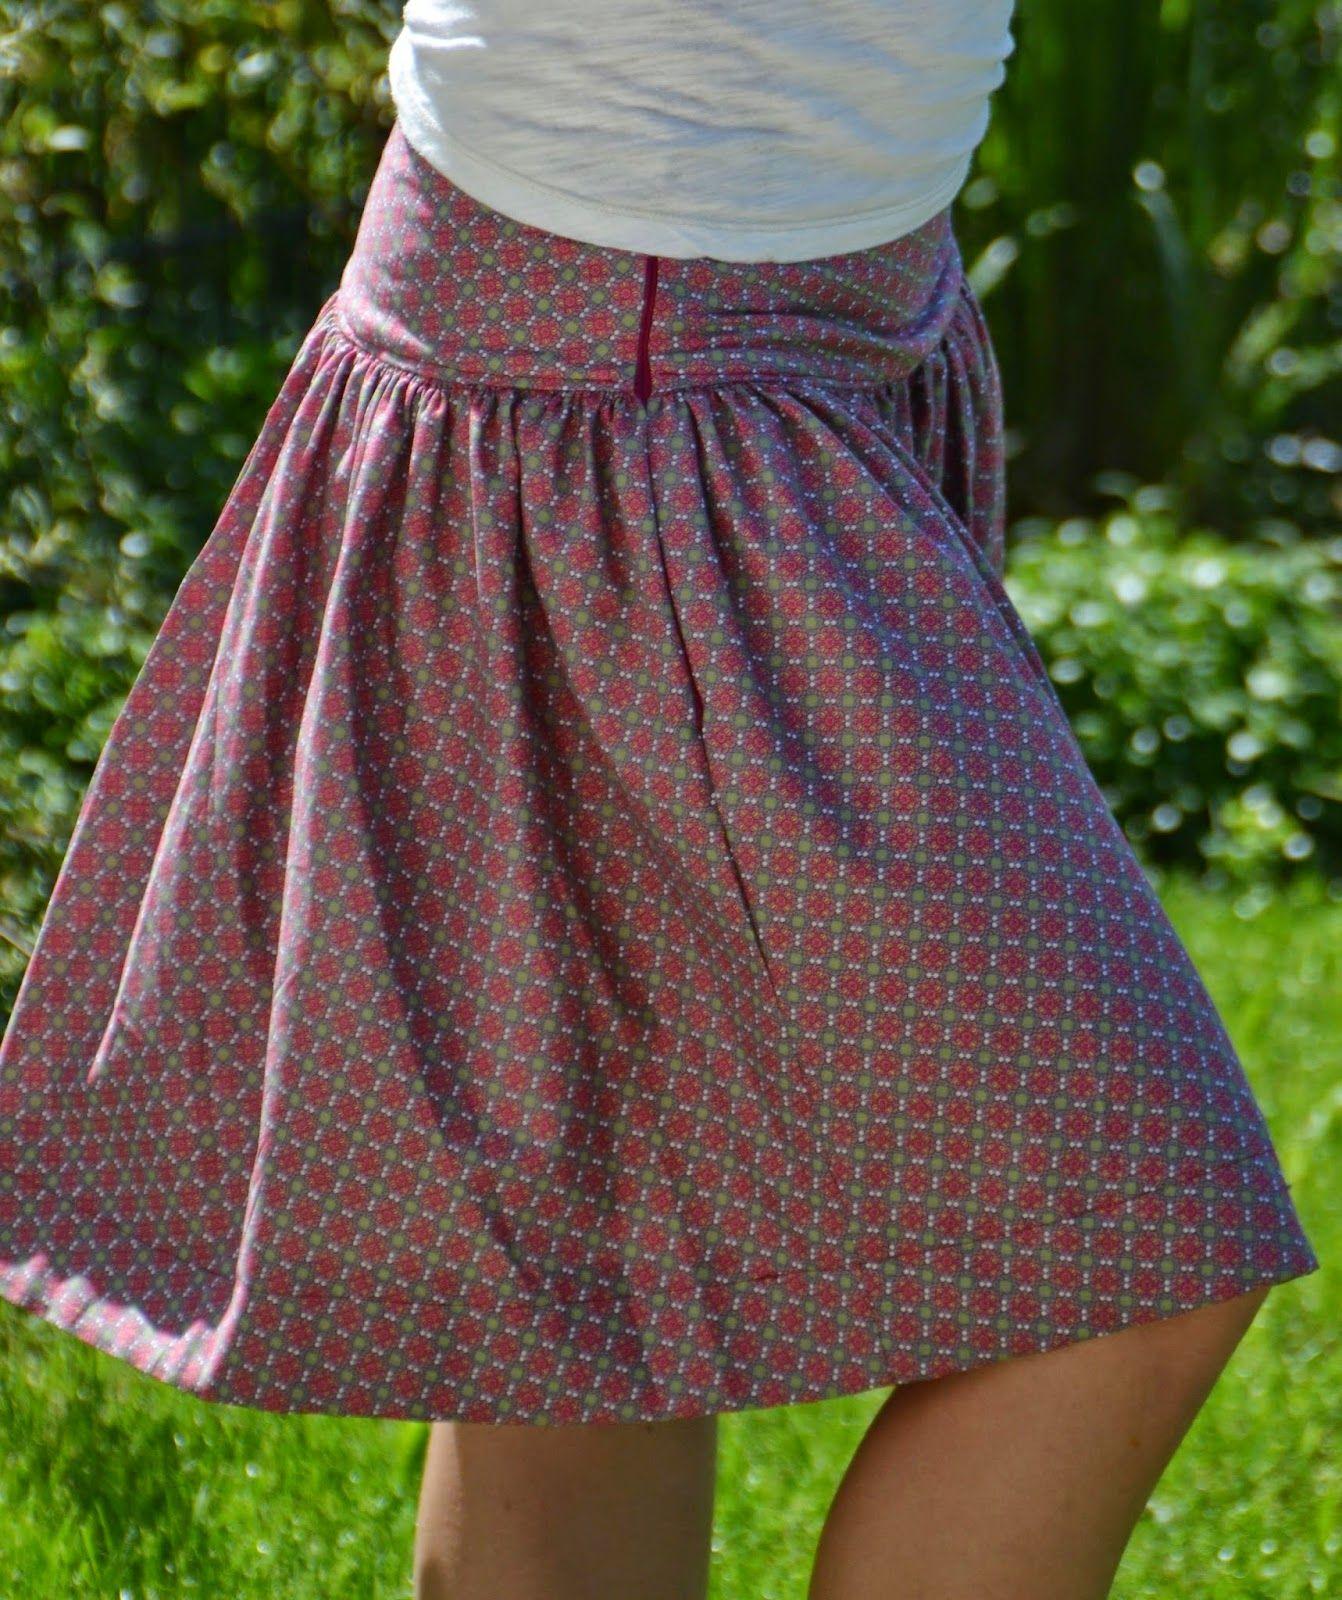 gagaya faltenrock 1 freebook online neue n hprojekte pinterest sewing sewing clothes. Black Bedroom Furniture Sets. Home Design Ideas